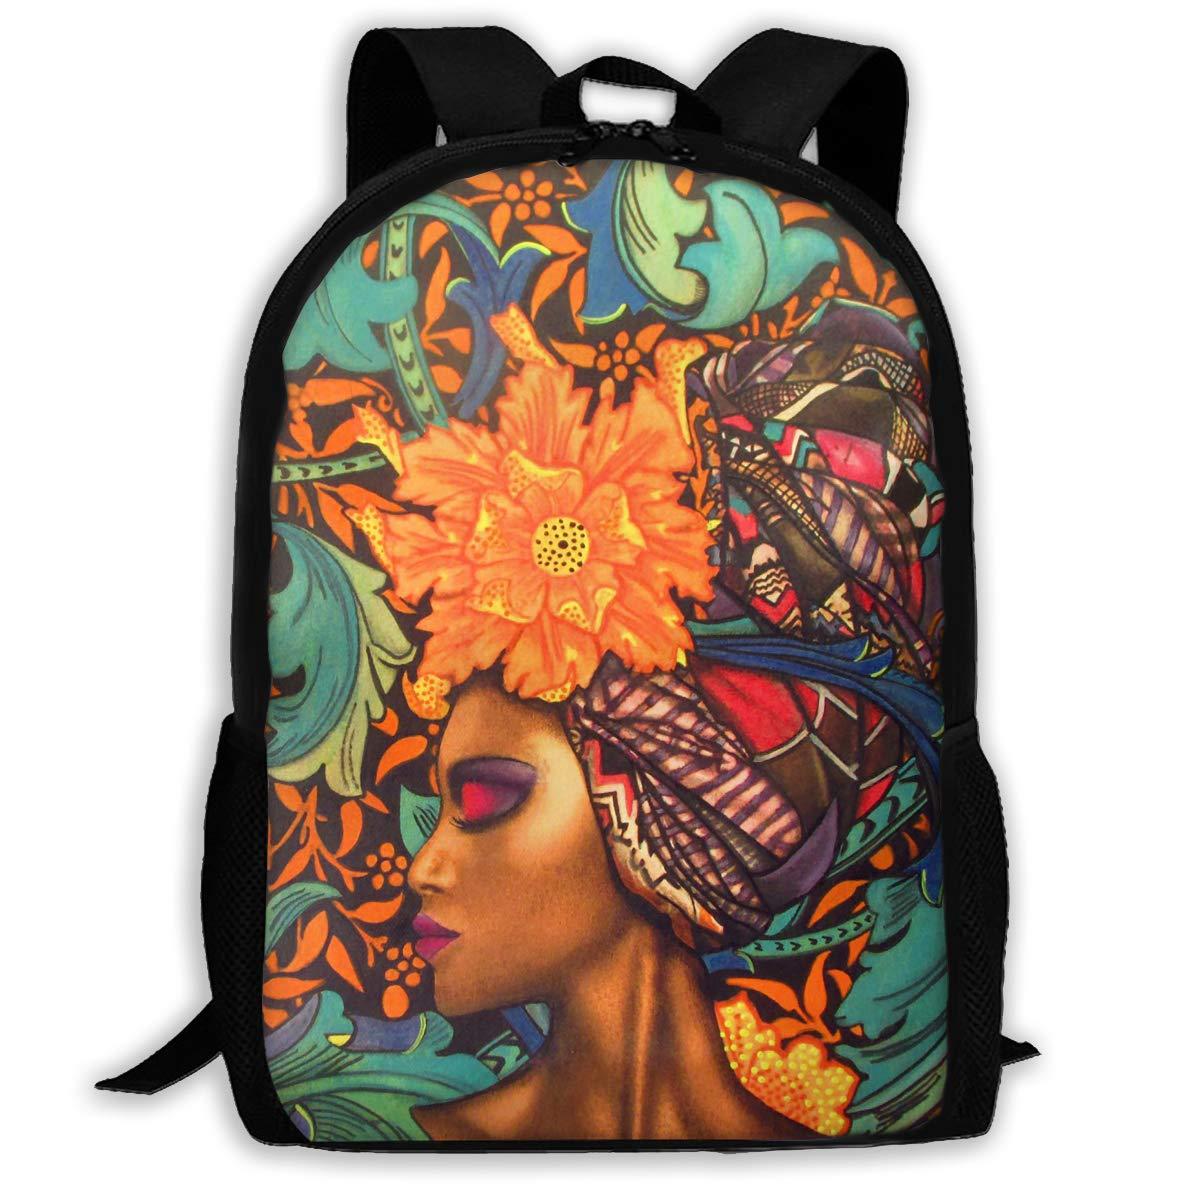 New Laptop Unisex Travel Bag High Quality School Backpack Waterproof US